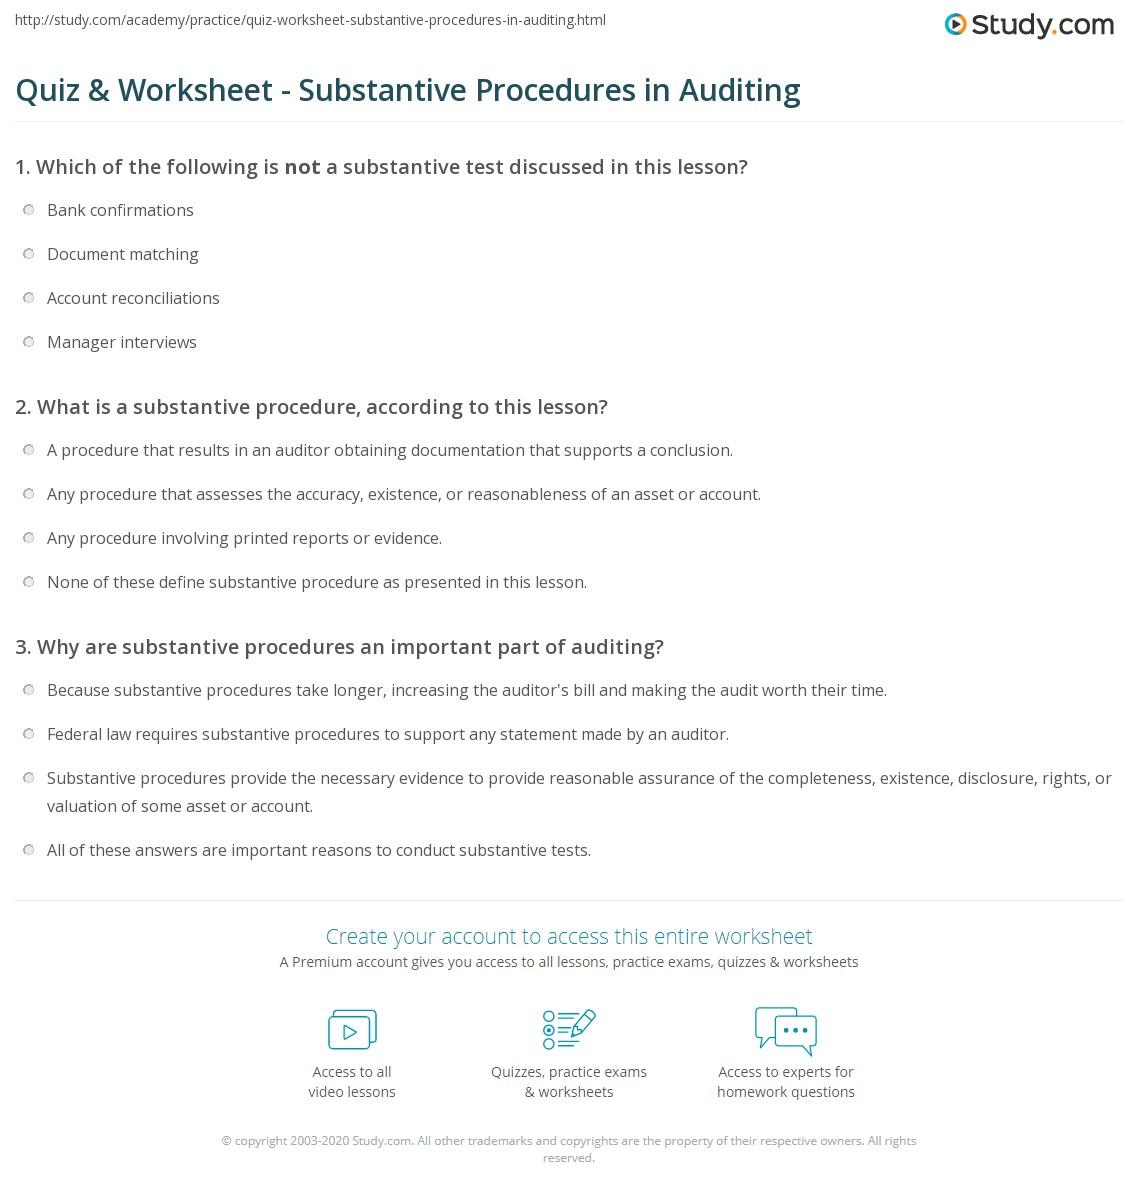 Substantive Procedures In Auditing